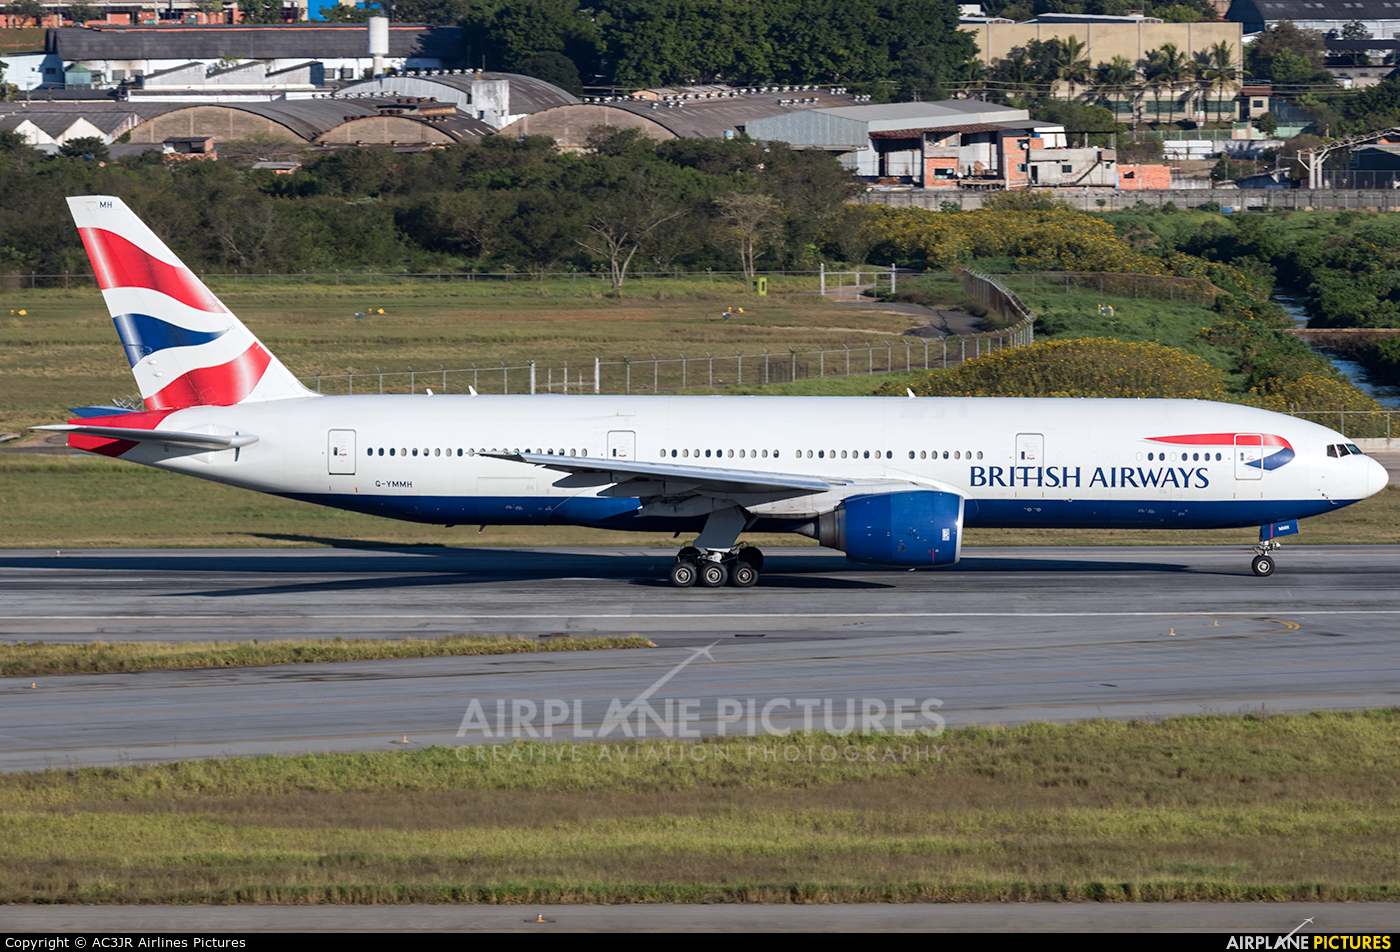 British Airways G-YMMH aircraft at São Paulo - Guarulhos